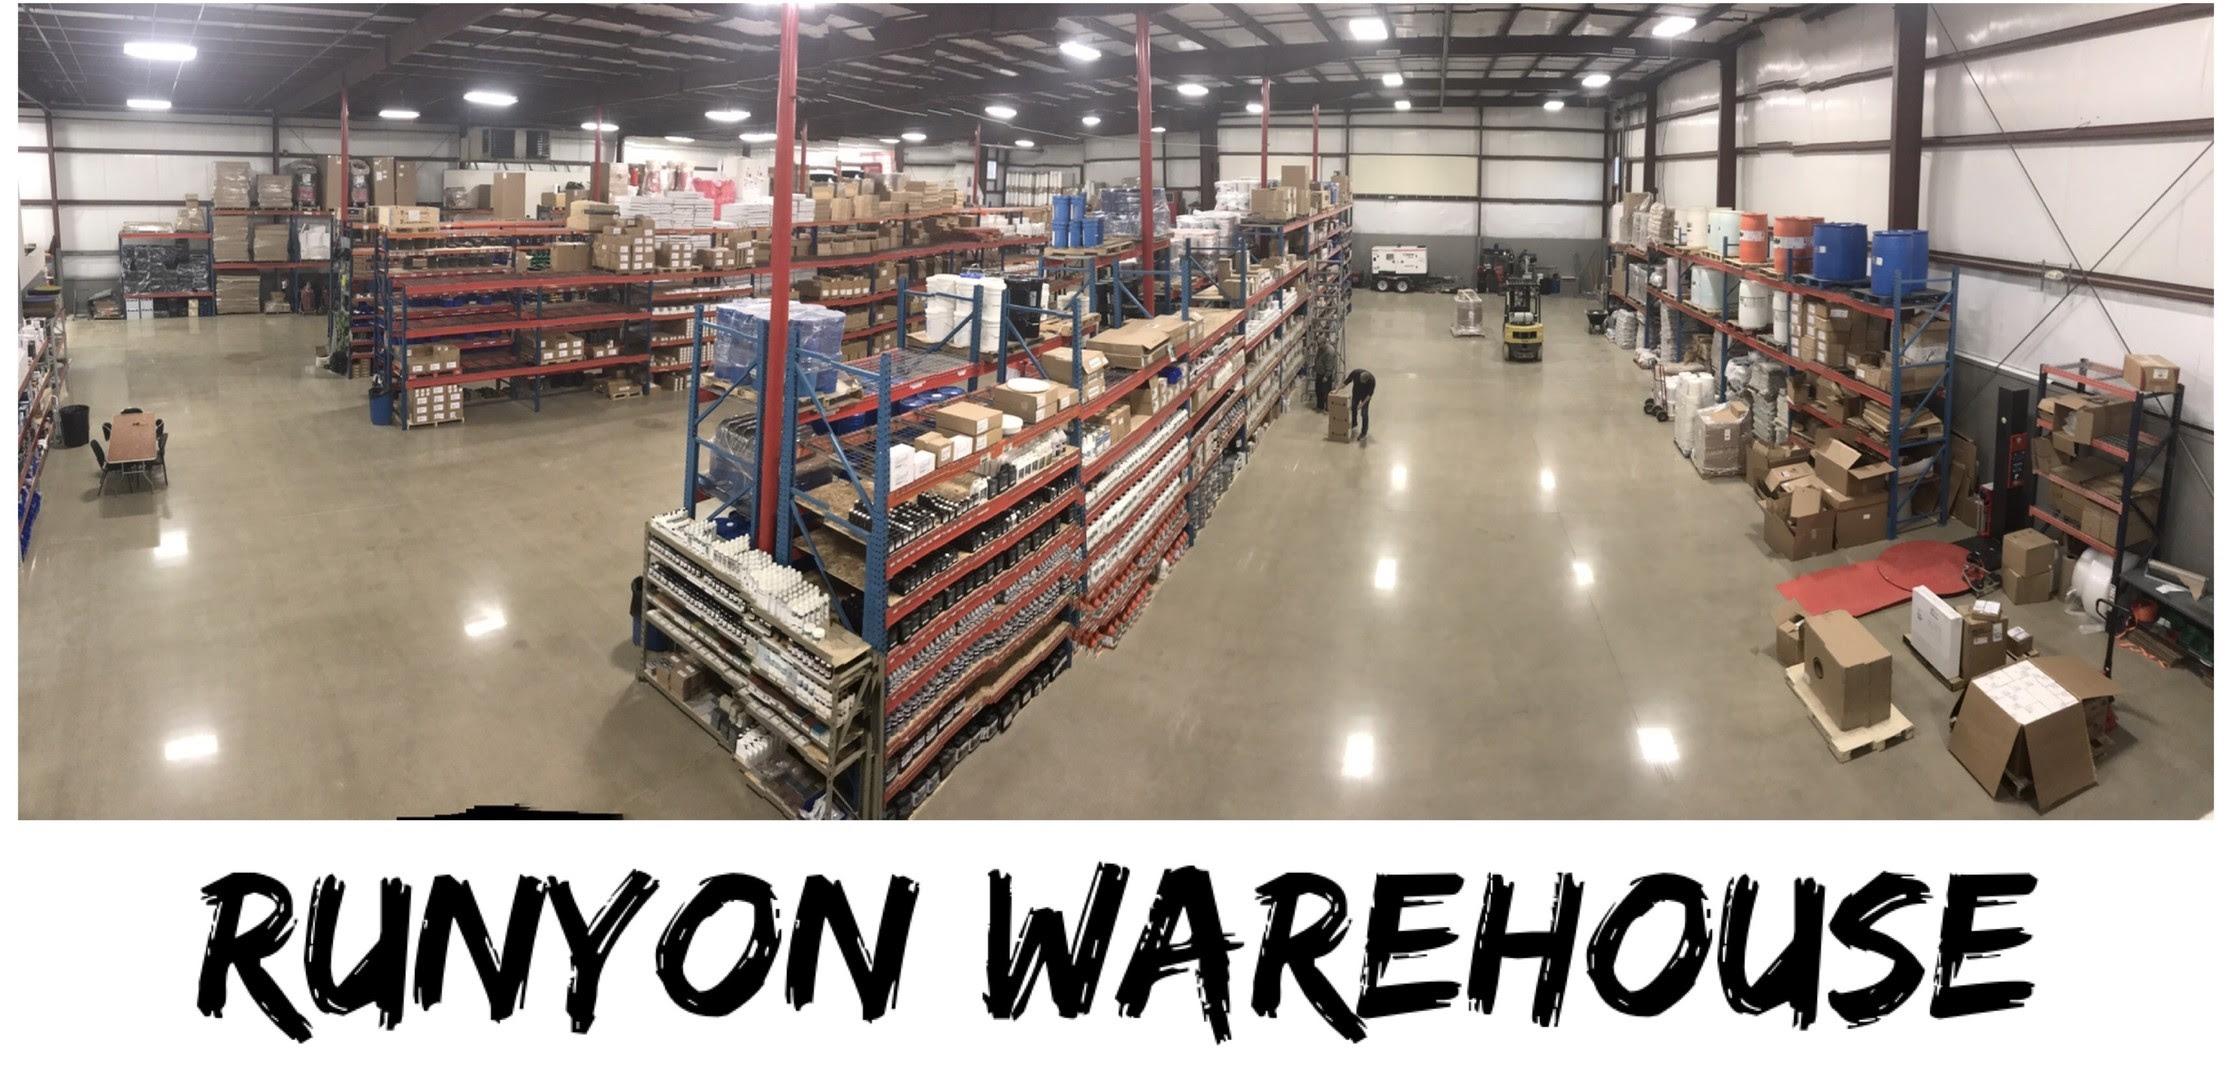 Runyon Warehouse